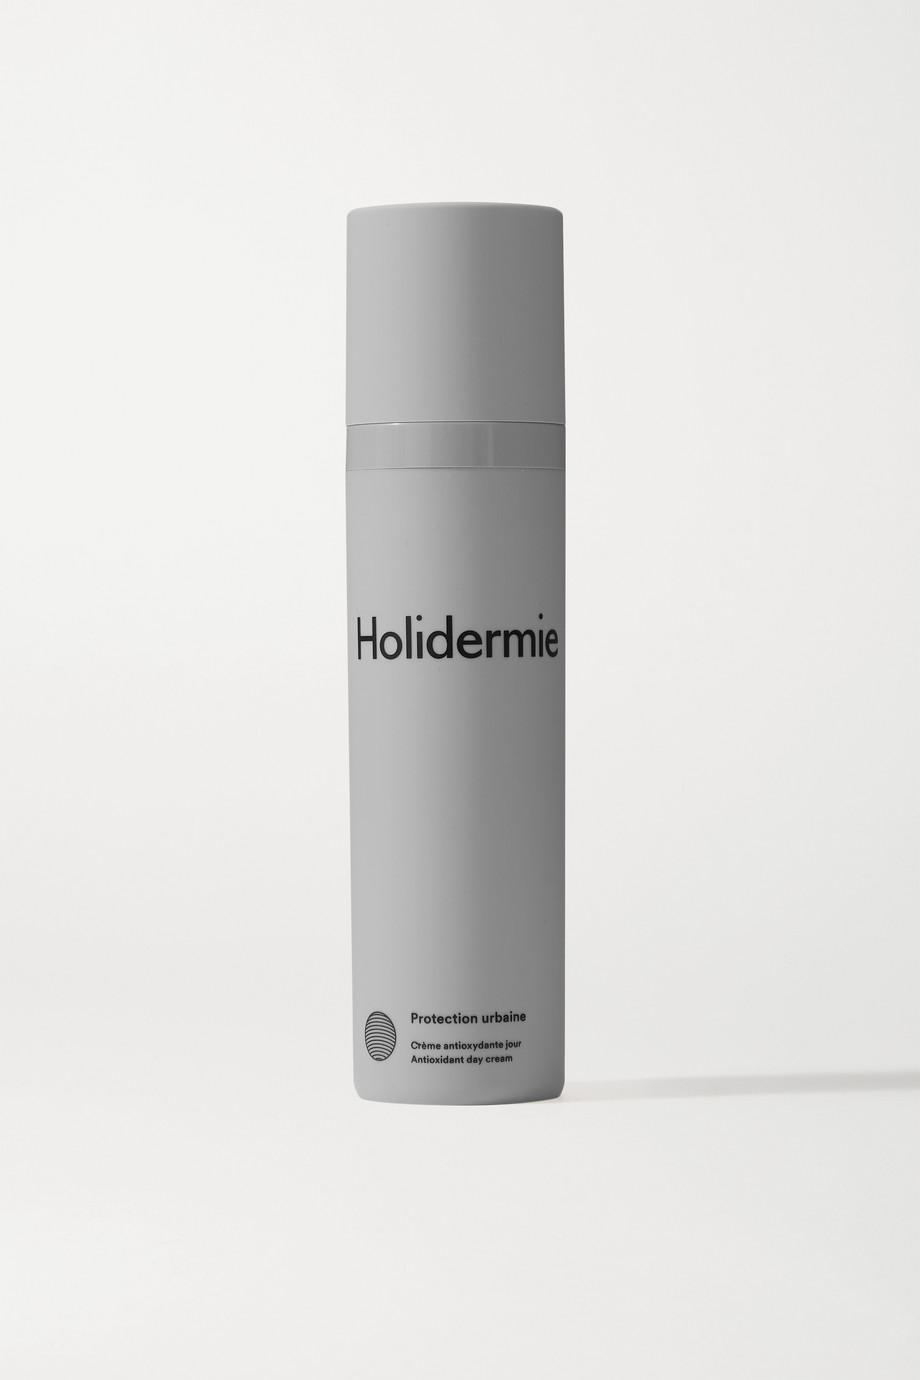 Holidermie Protection Urbaine Antioxidant Day Cream, 50 ml – Gesichtscreme